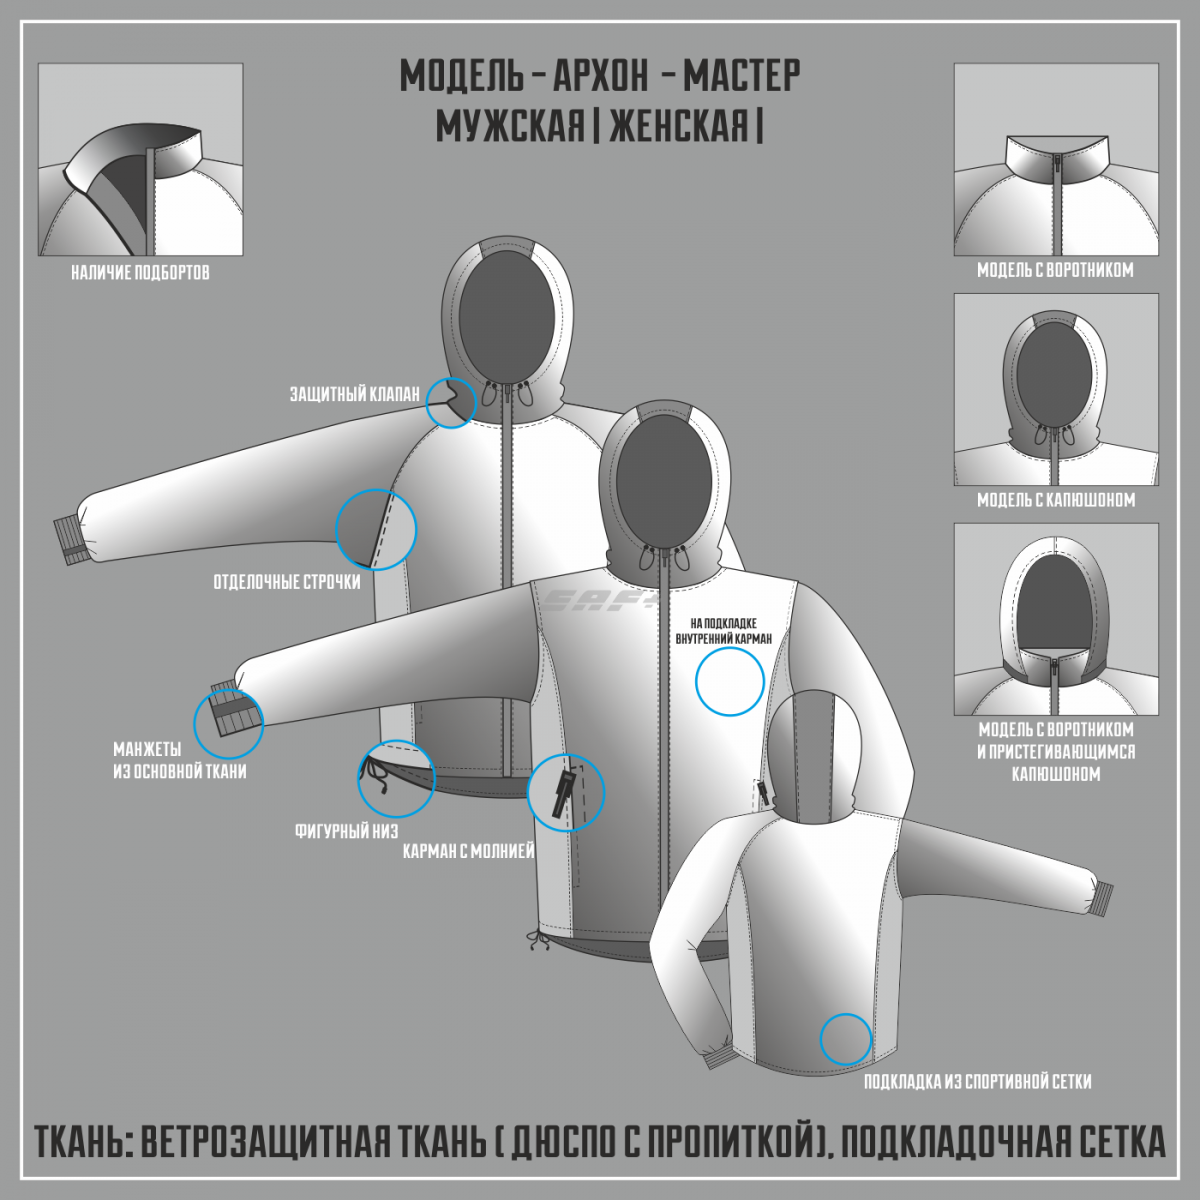 АРХОН-МАСТЕР ветровка (Частичная сублимация)